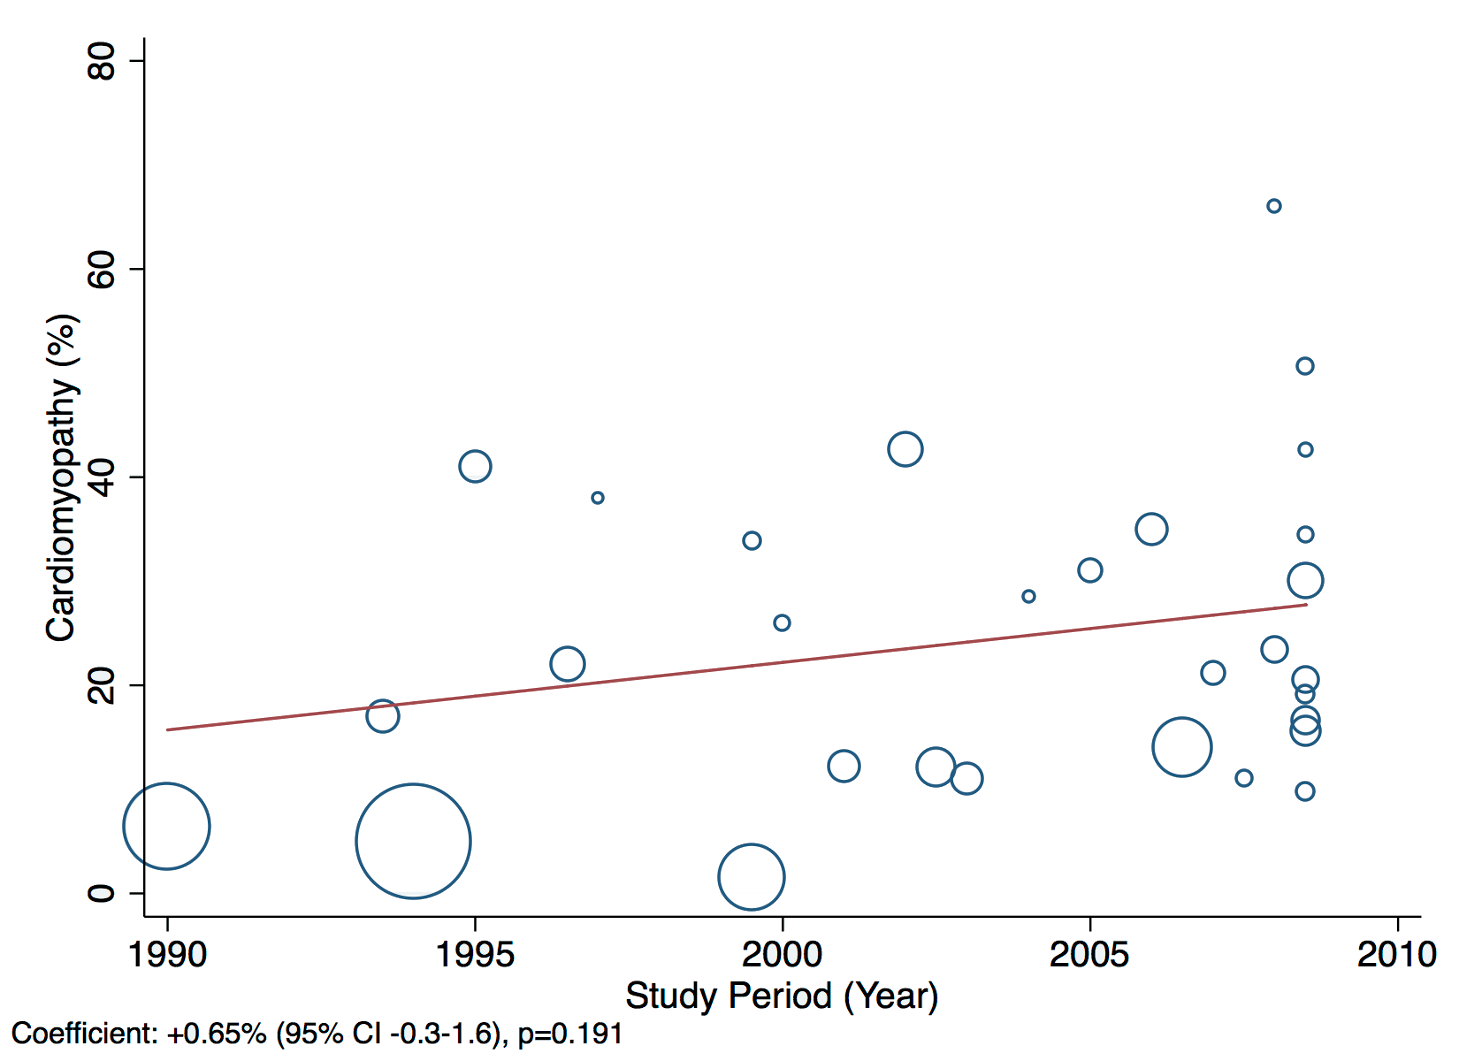 Meta-regression of cardiomyopathies against study period.